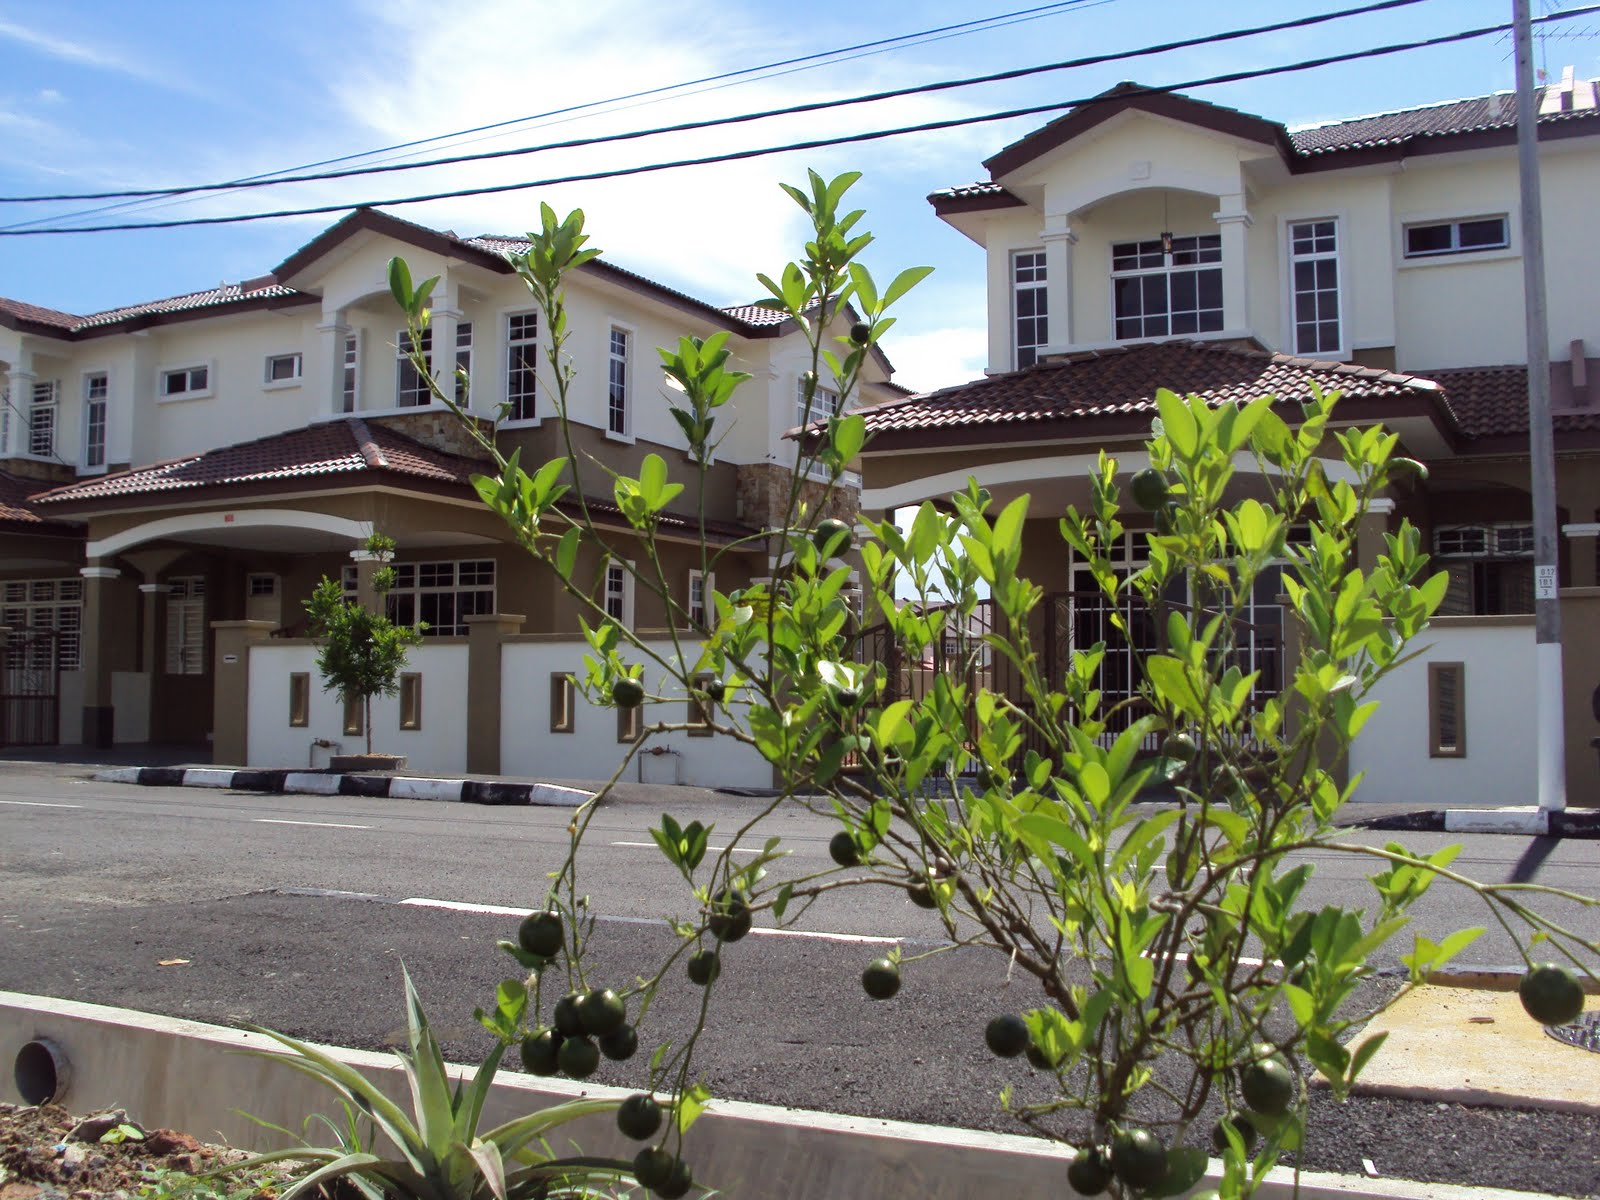 Jitra Malaysia  city images : Siti Guesthouse, Jitra, Kedah, Malaysia Northern Peninsular 013 ...